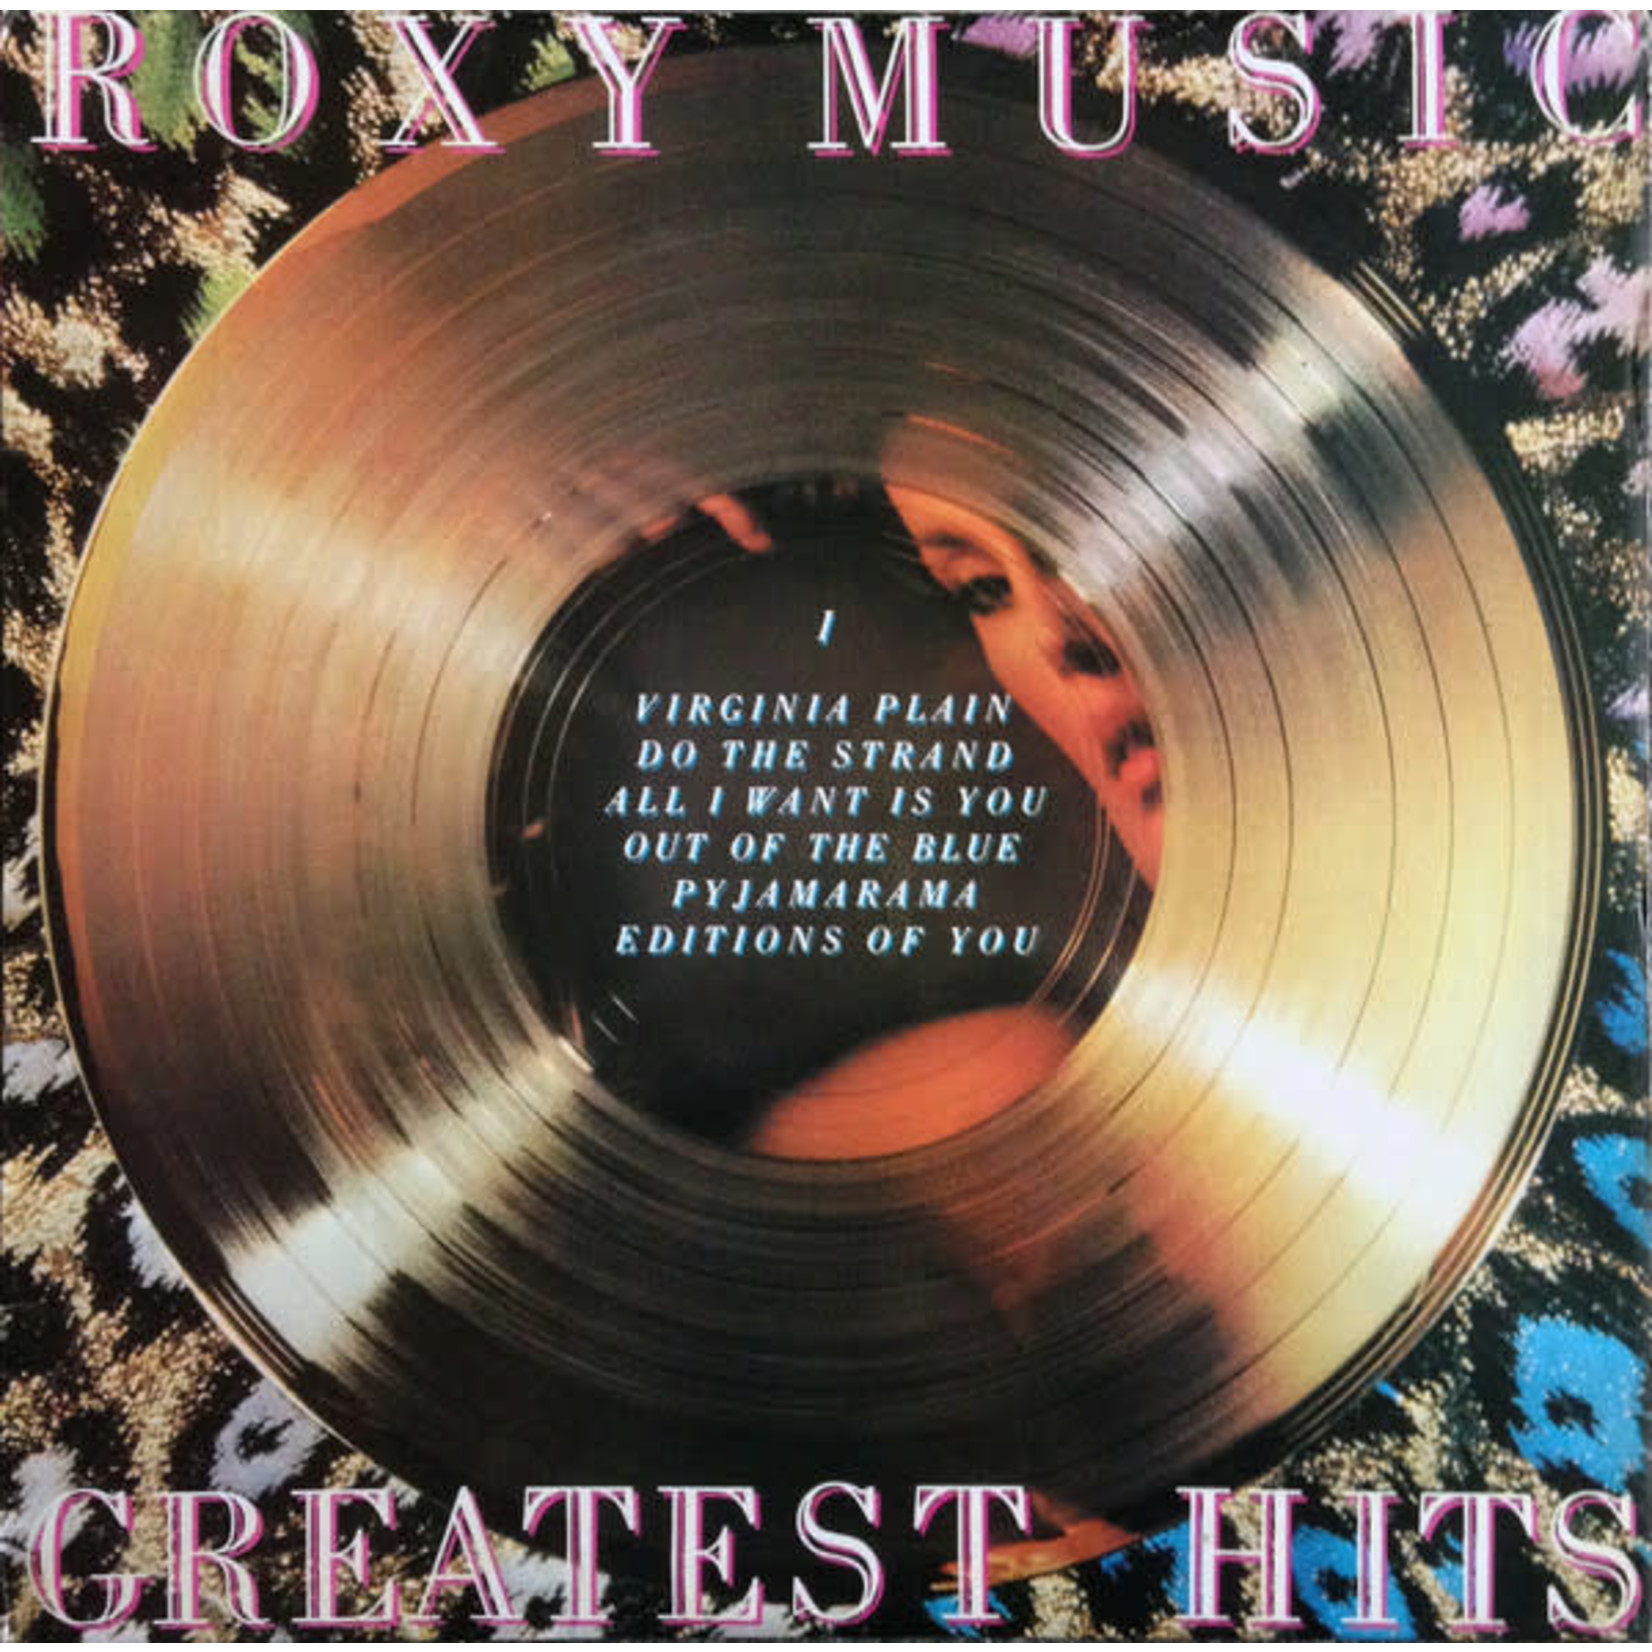 [Vintage] Roxy Music: Greatest Hits